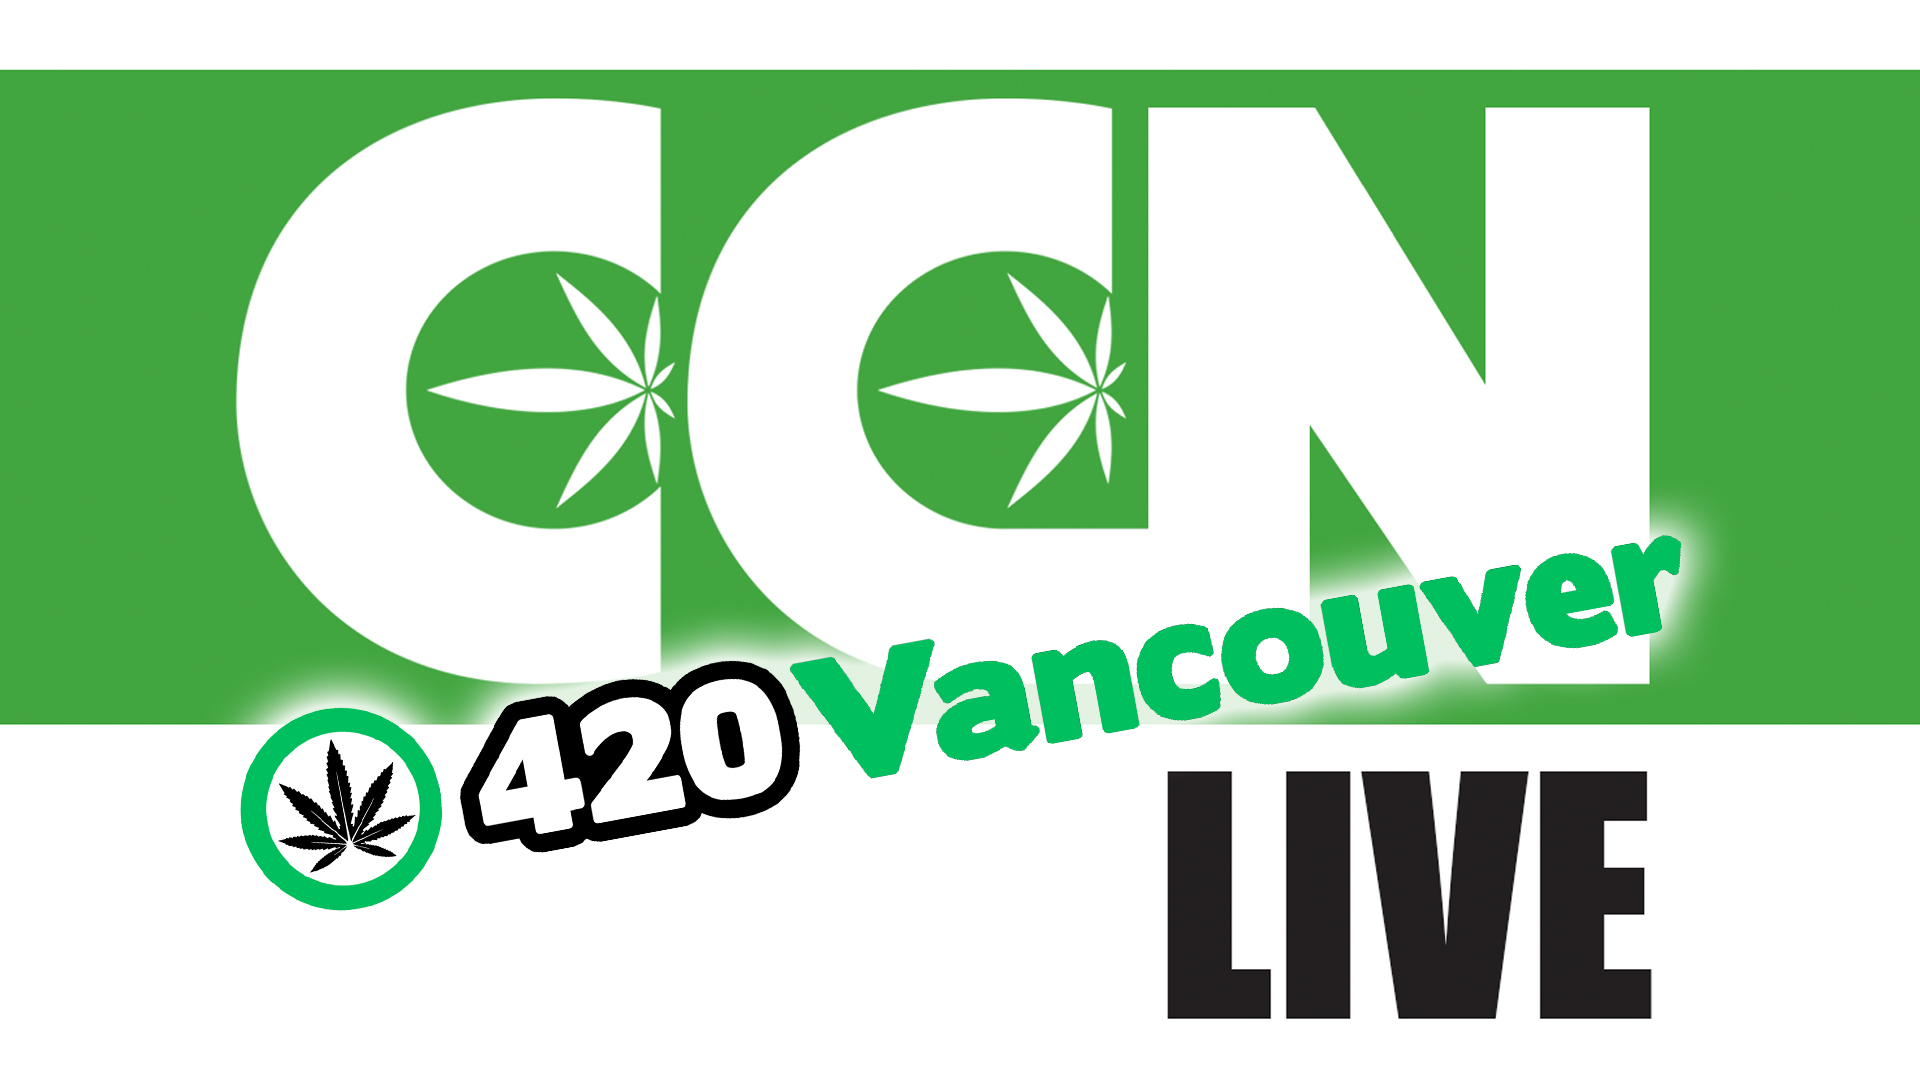 ccn-live-420-vancouver-2016